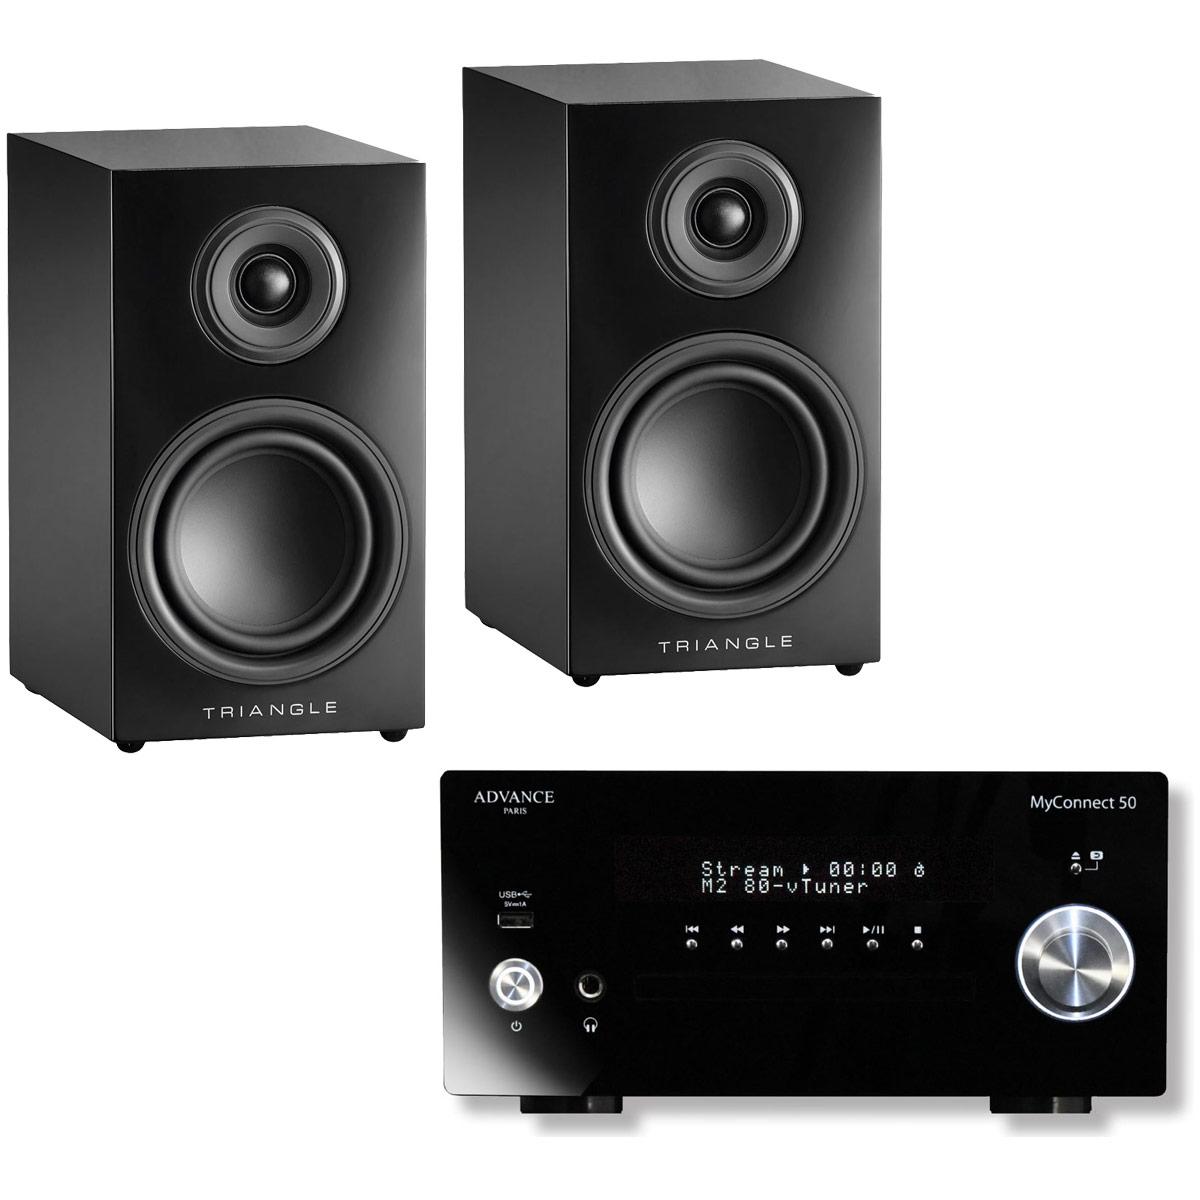 Chaîne Hifi Advance Acoustic MyConnect 50 + Triangle Elara LN01 Noir Laqué Micro-chaîne 2 x 70 Watts CD/FM - Wi-Fi/Bluetooth - AirPlay - Multiroom (sans haut-parleurs) + Enceinte bibliothèque compacte 50 W Bass-Reflex (par paire)